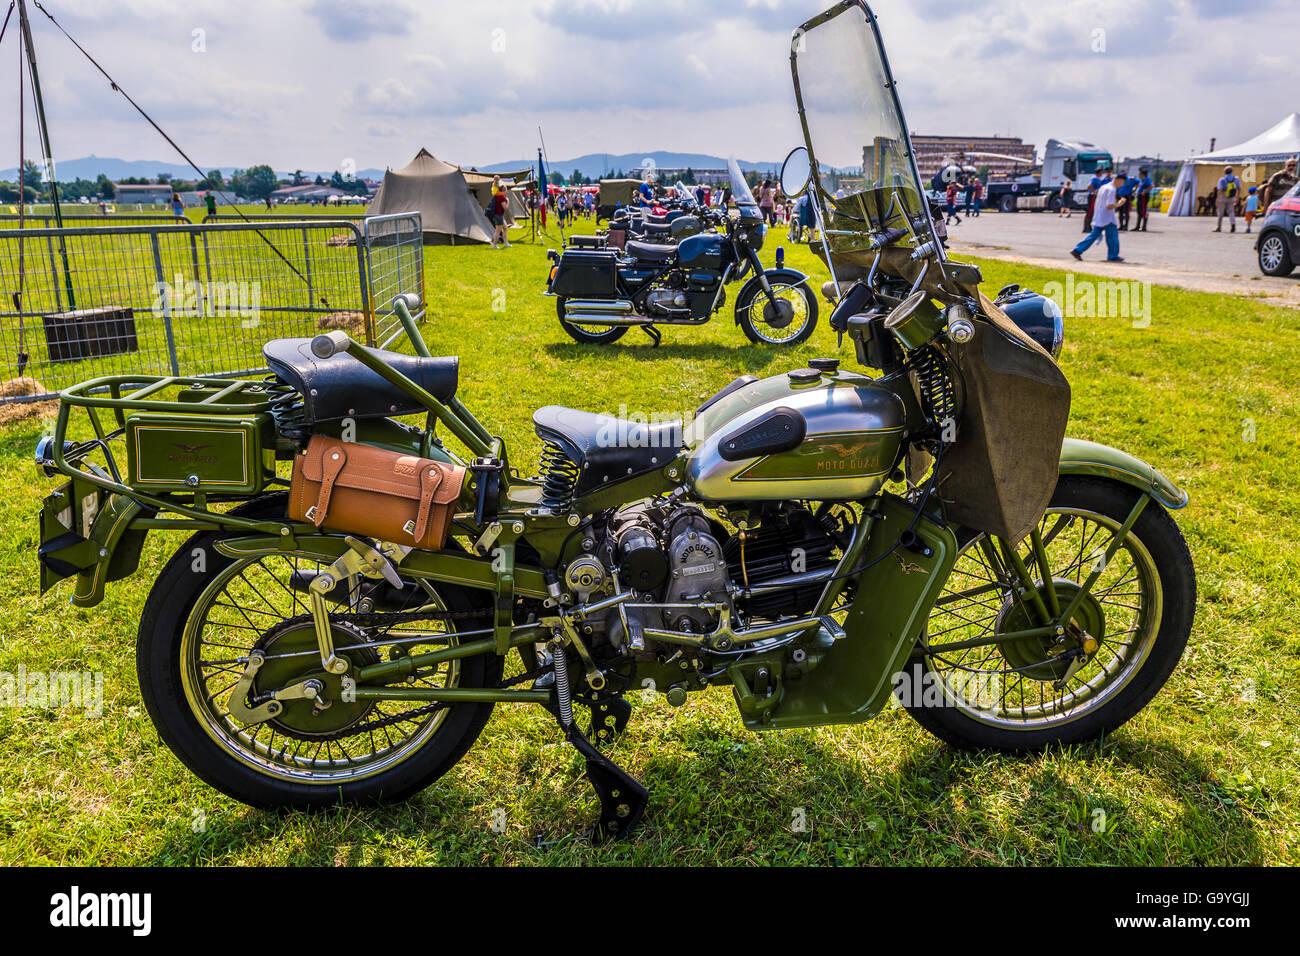 Italy Turin Collegno Aereoclub Event July 2, 2016 Centennial Airport Torino Aeritalia - 1916/2016, Ancient Moto - Stock Image